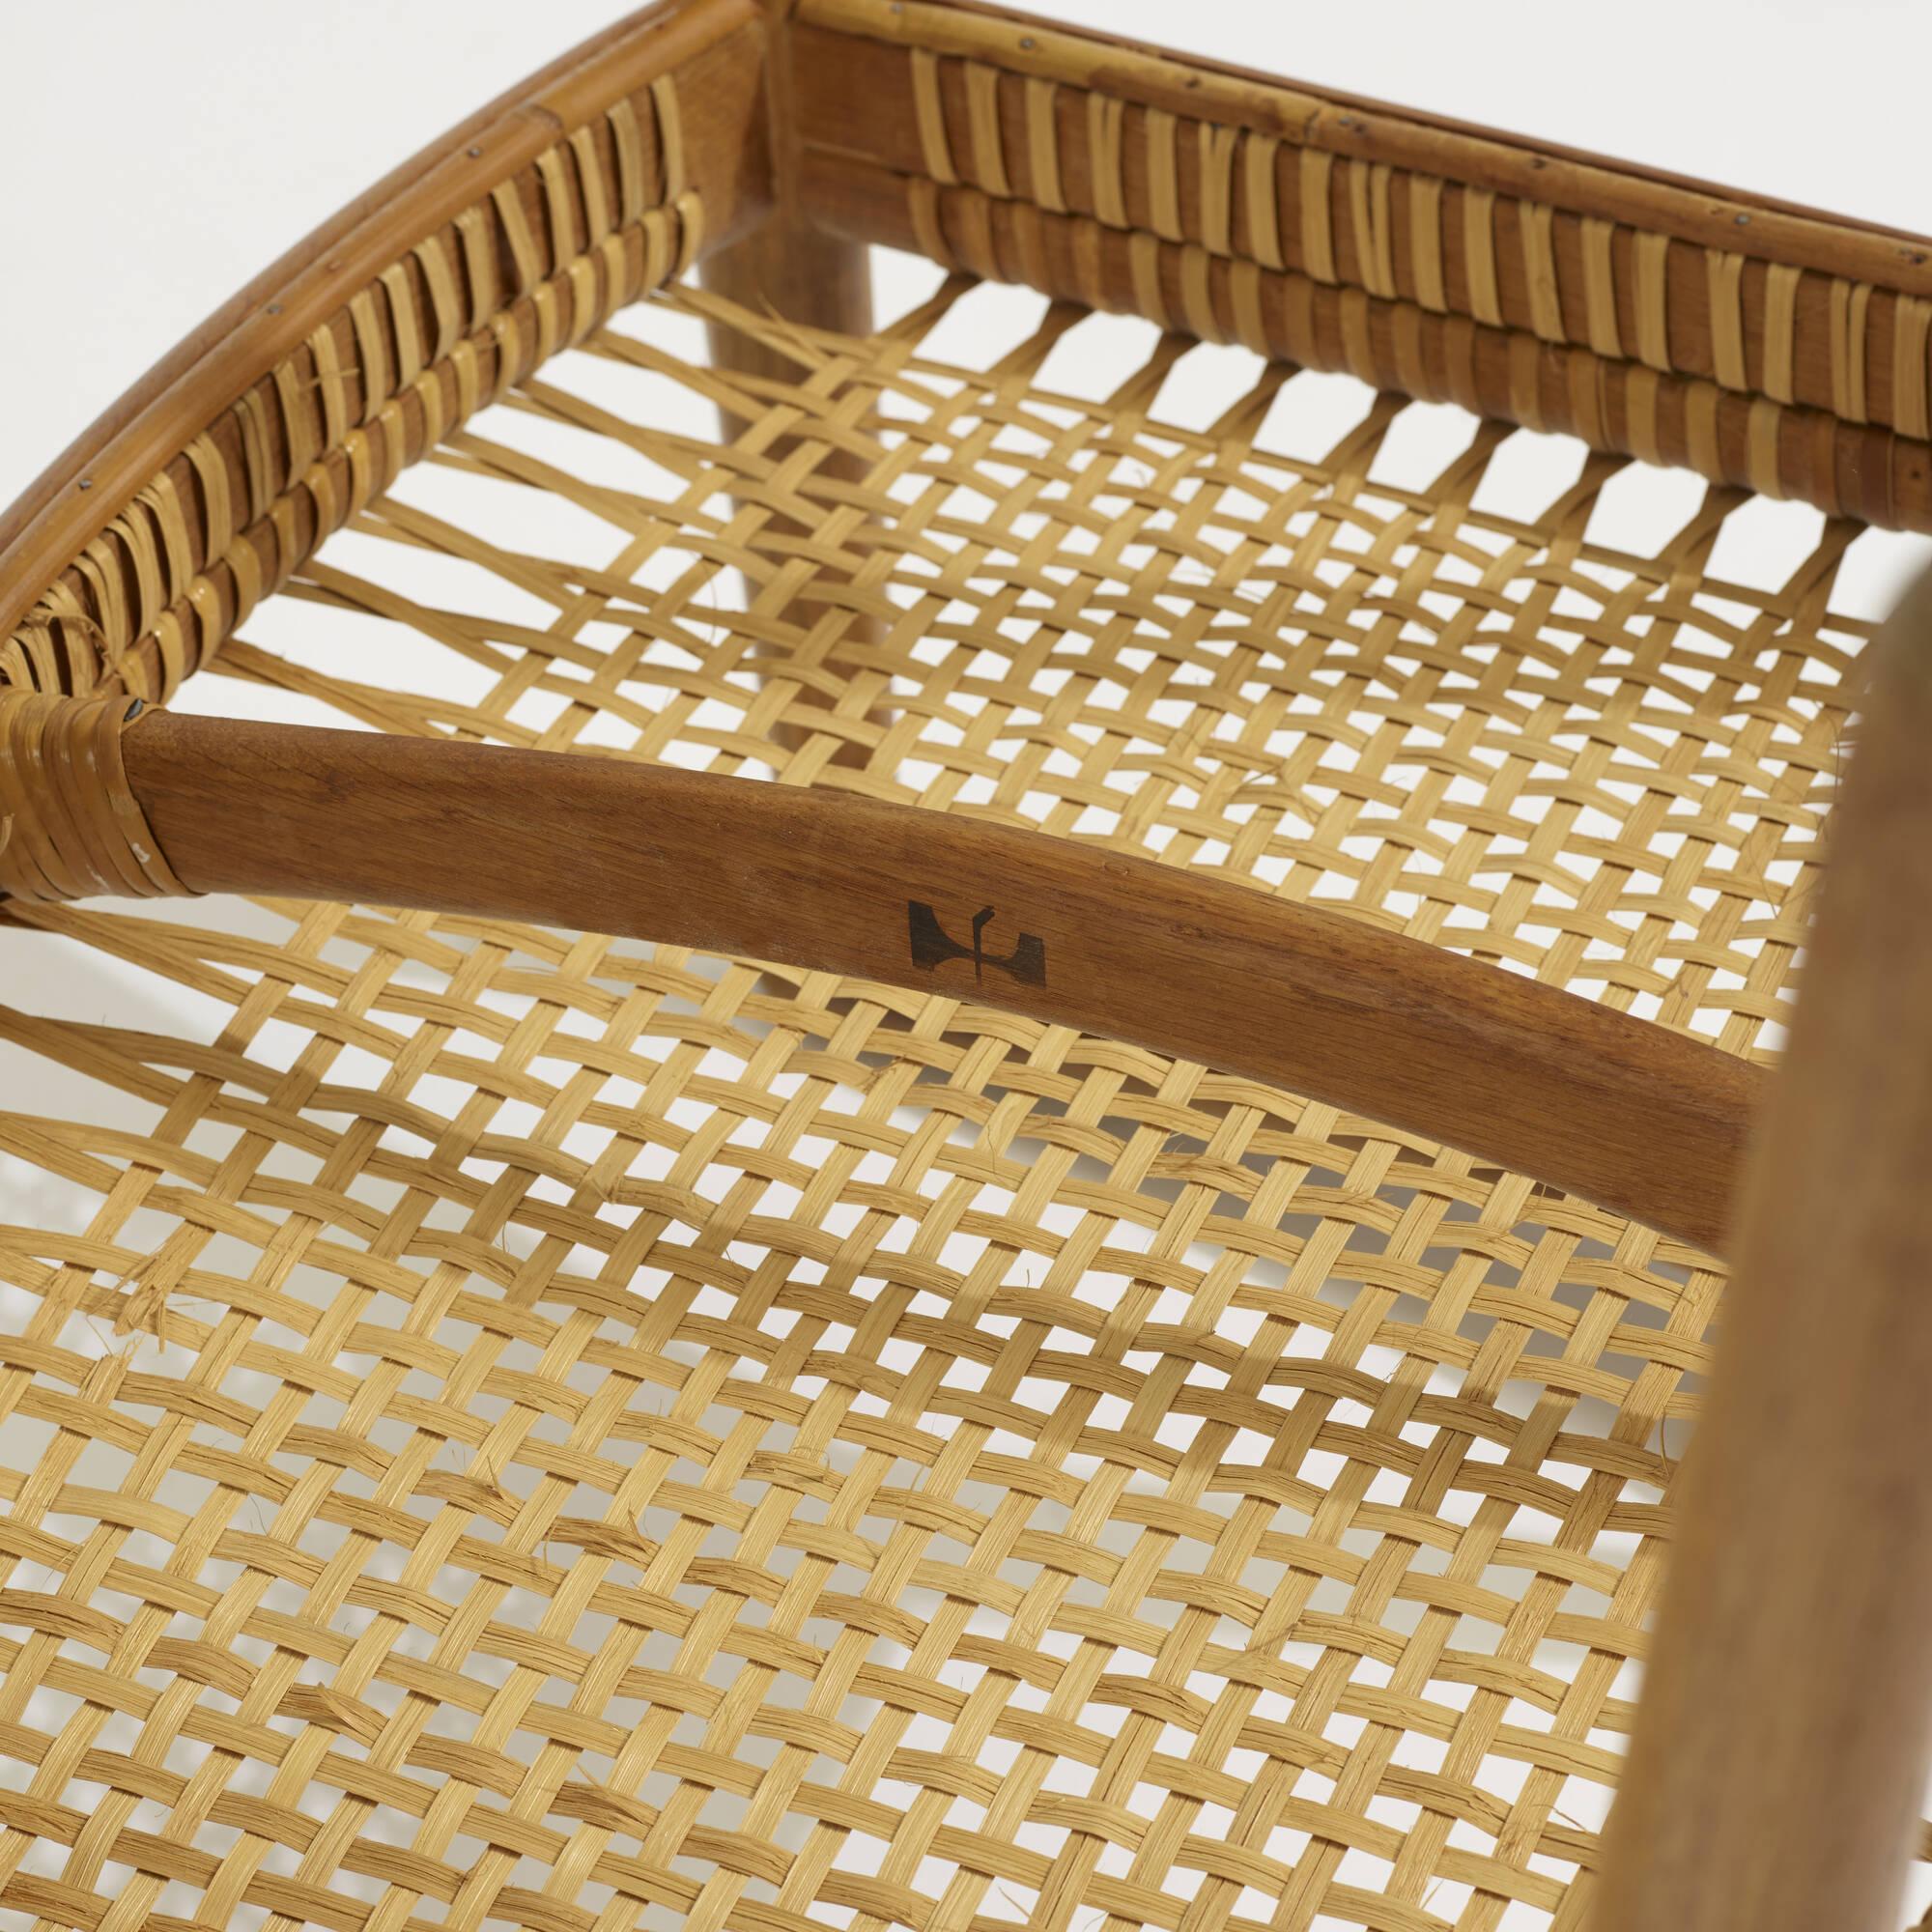 316: Hans J. Wegner / The Chairs, pair (3 of 3)